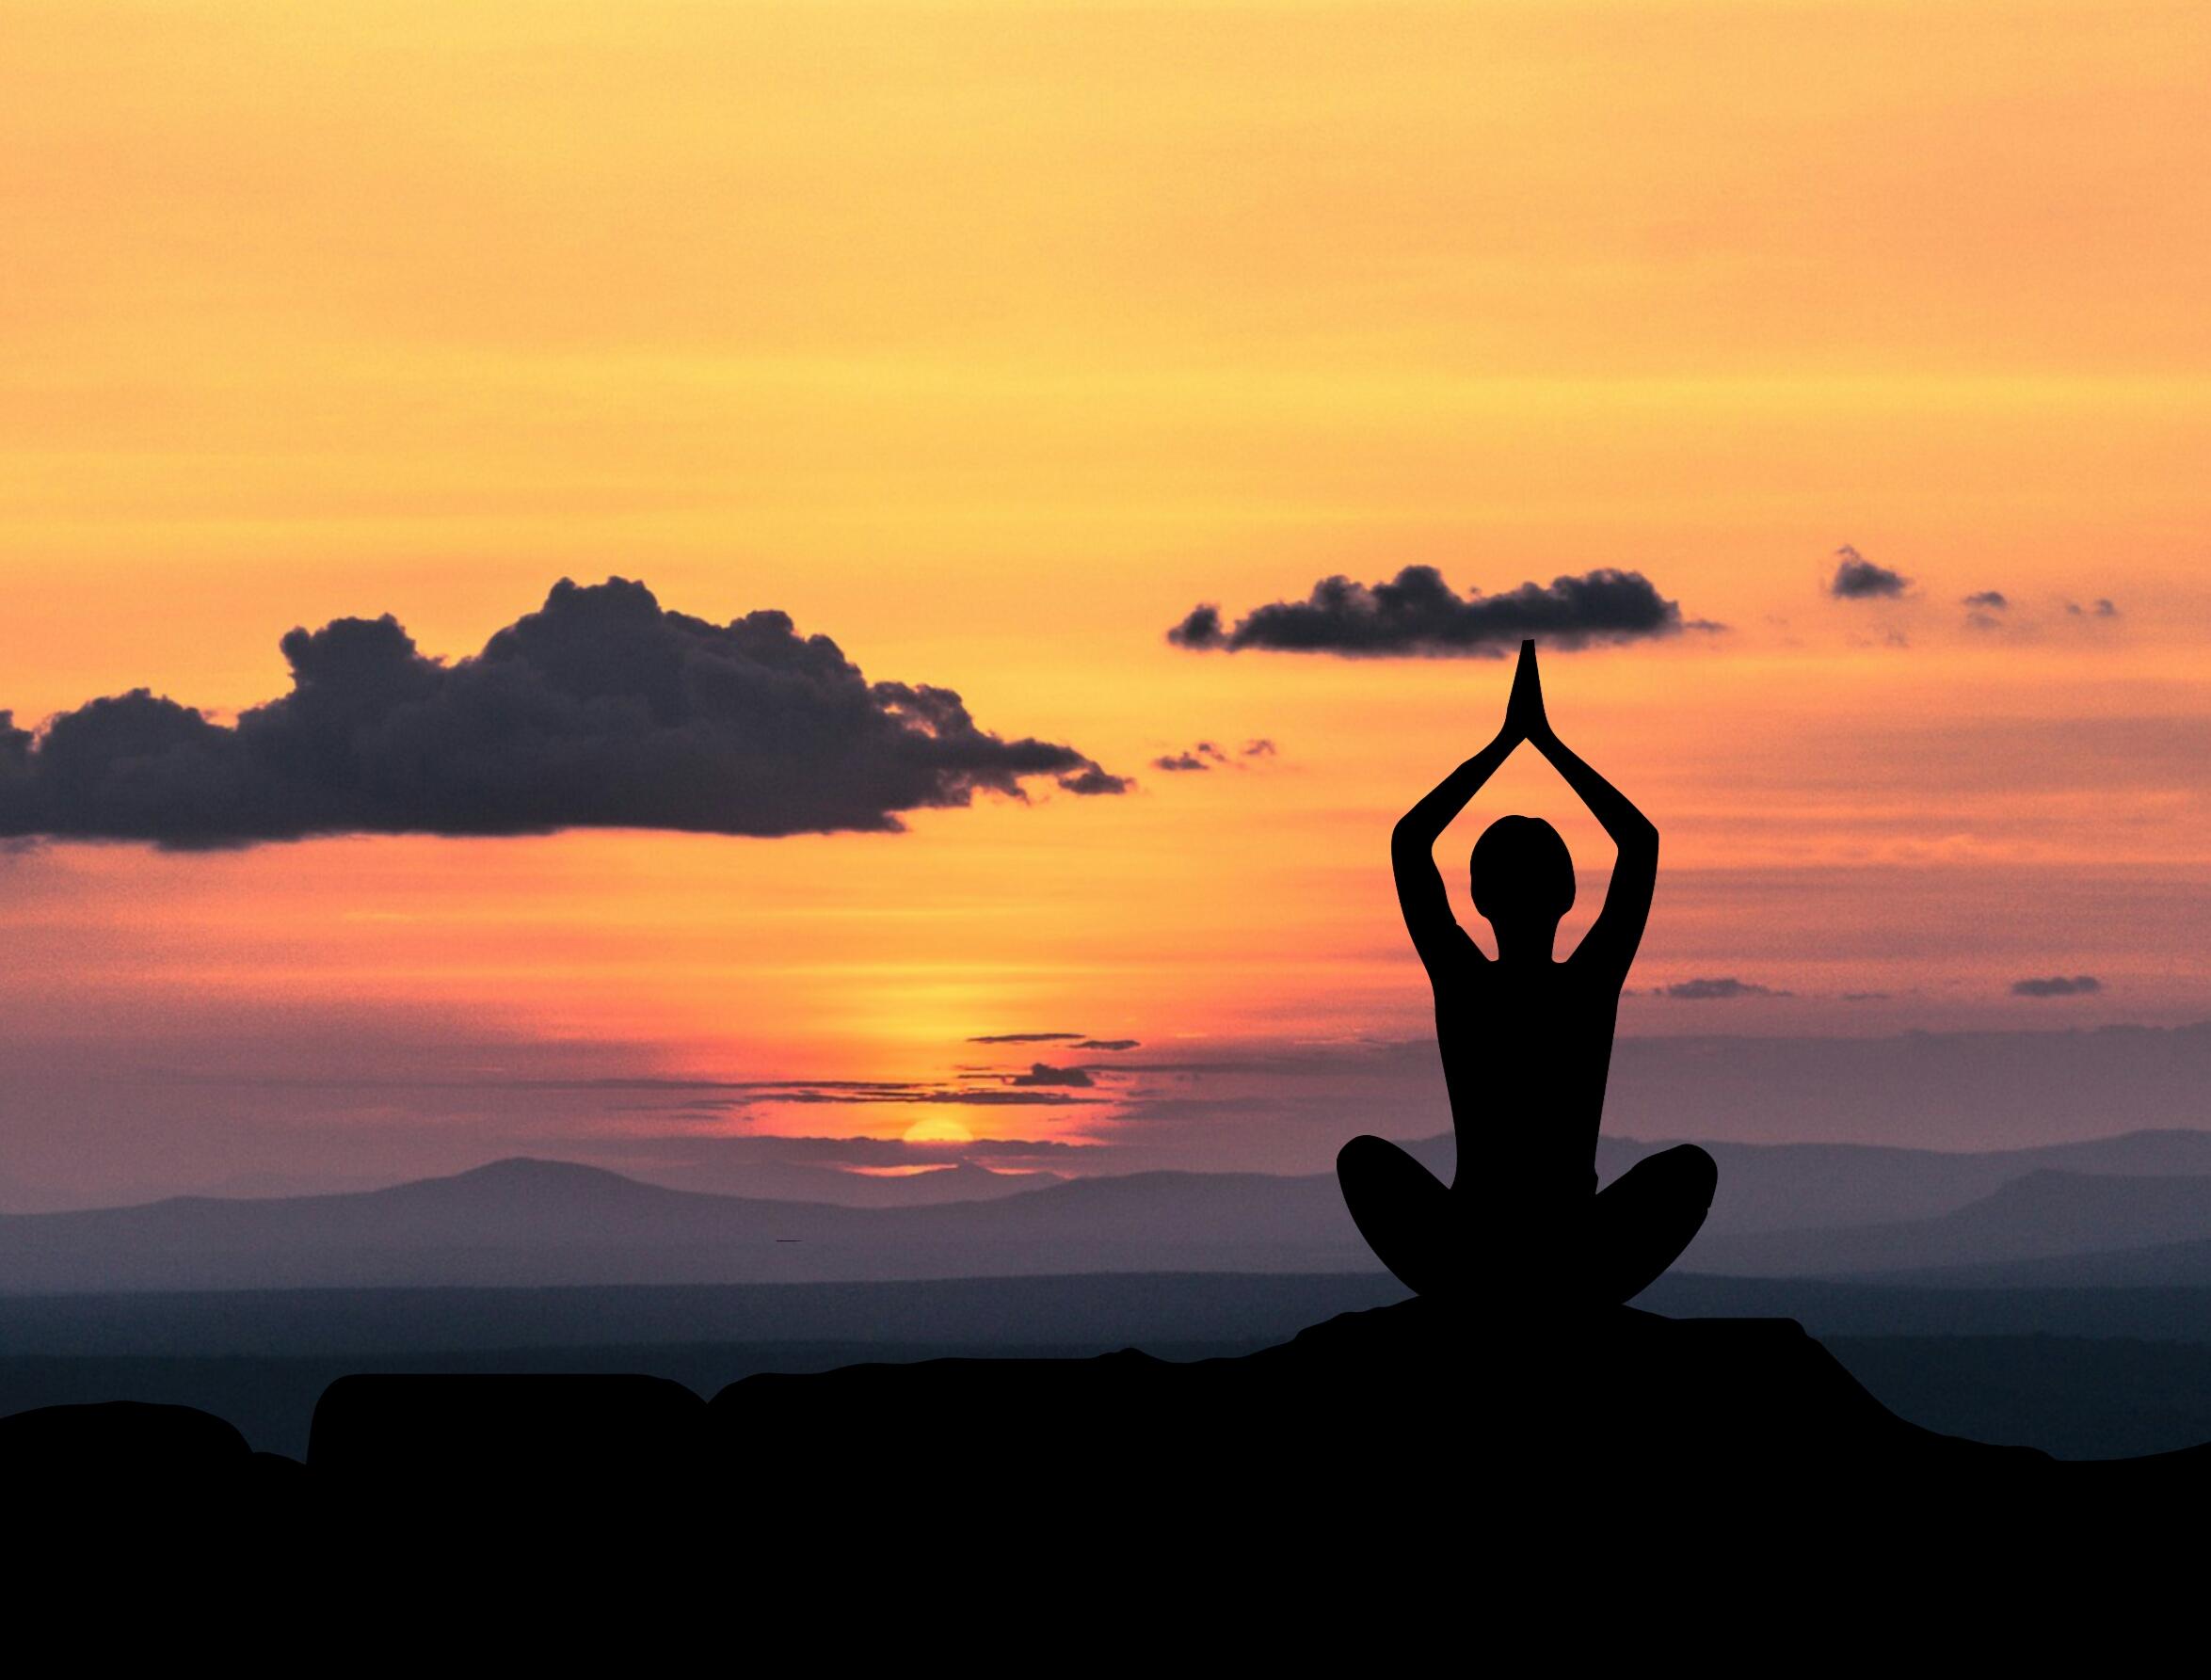 Free Images Meditation Zen Chan Yoga Statue Rest Art Figure Trance Relaxation Wisdom Soul Harmony New Age Spiritual Brain Sync Wave